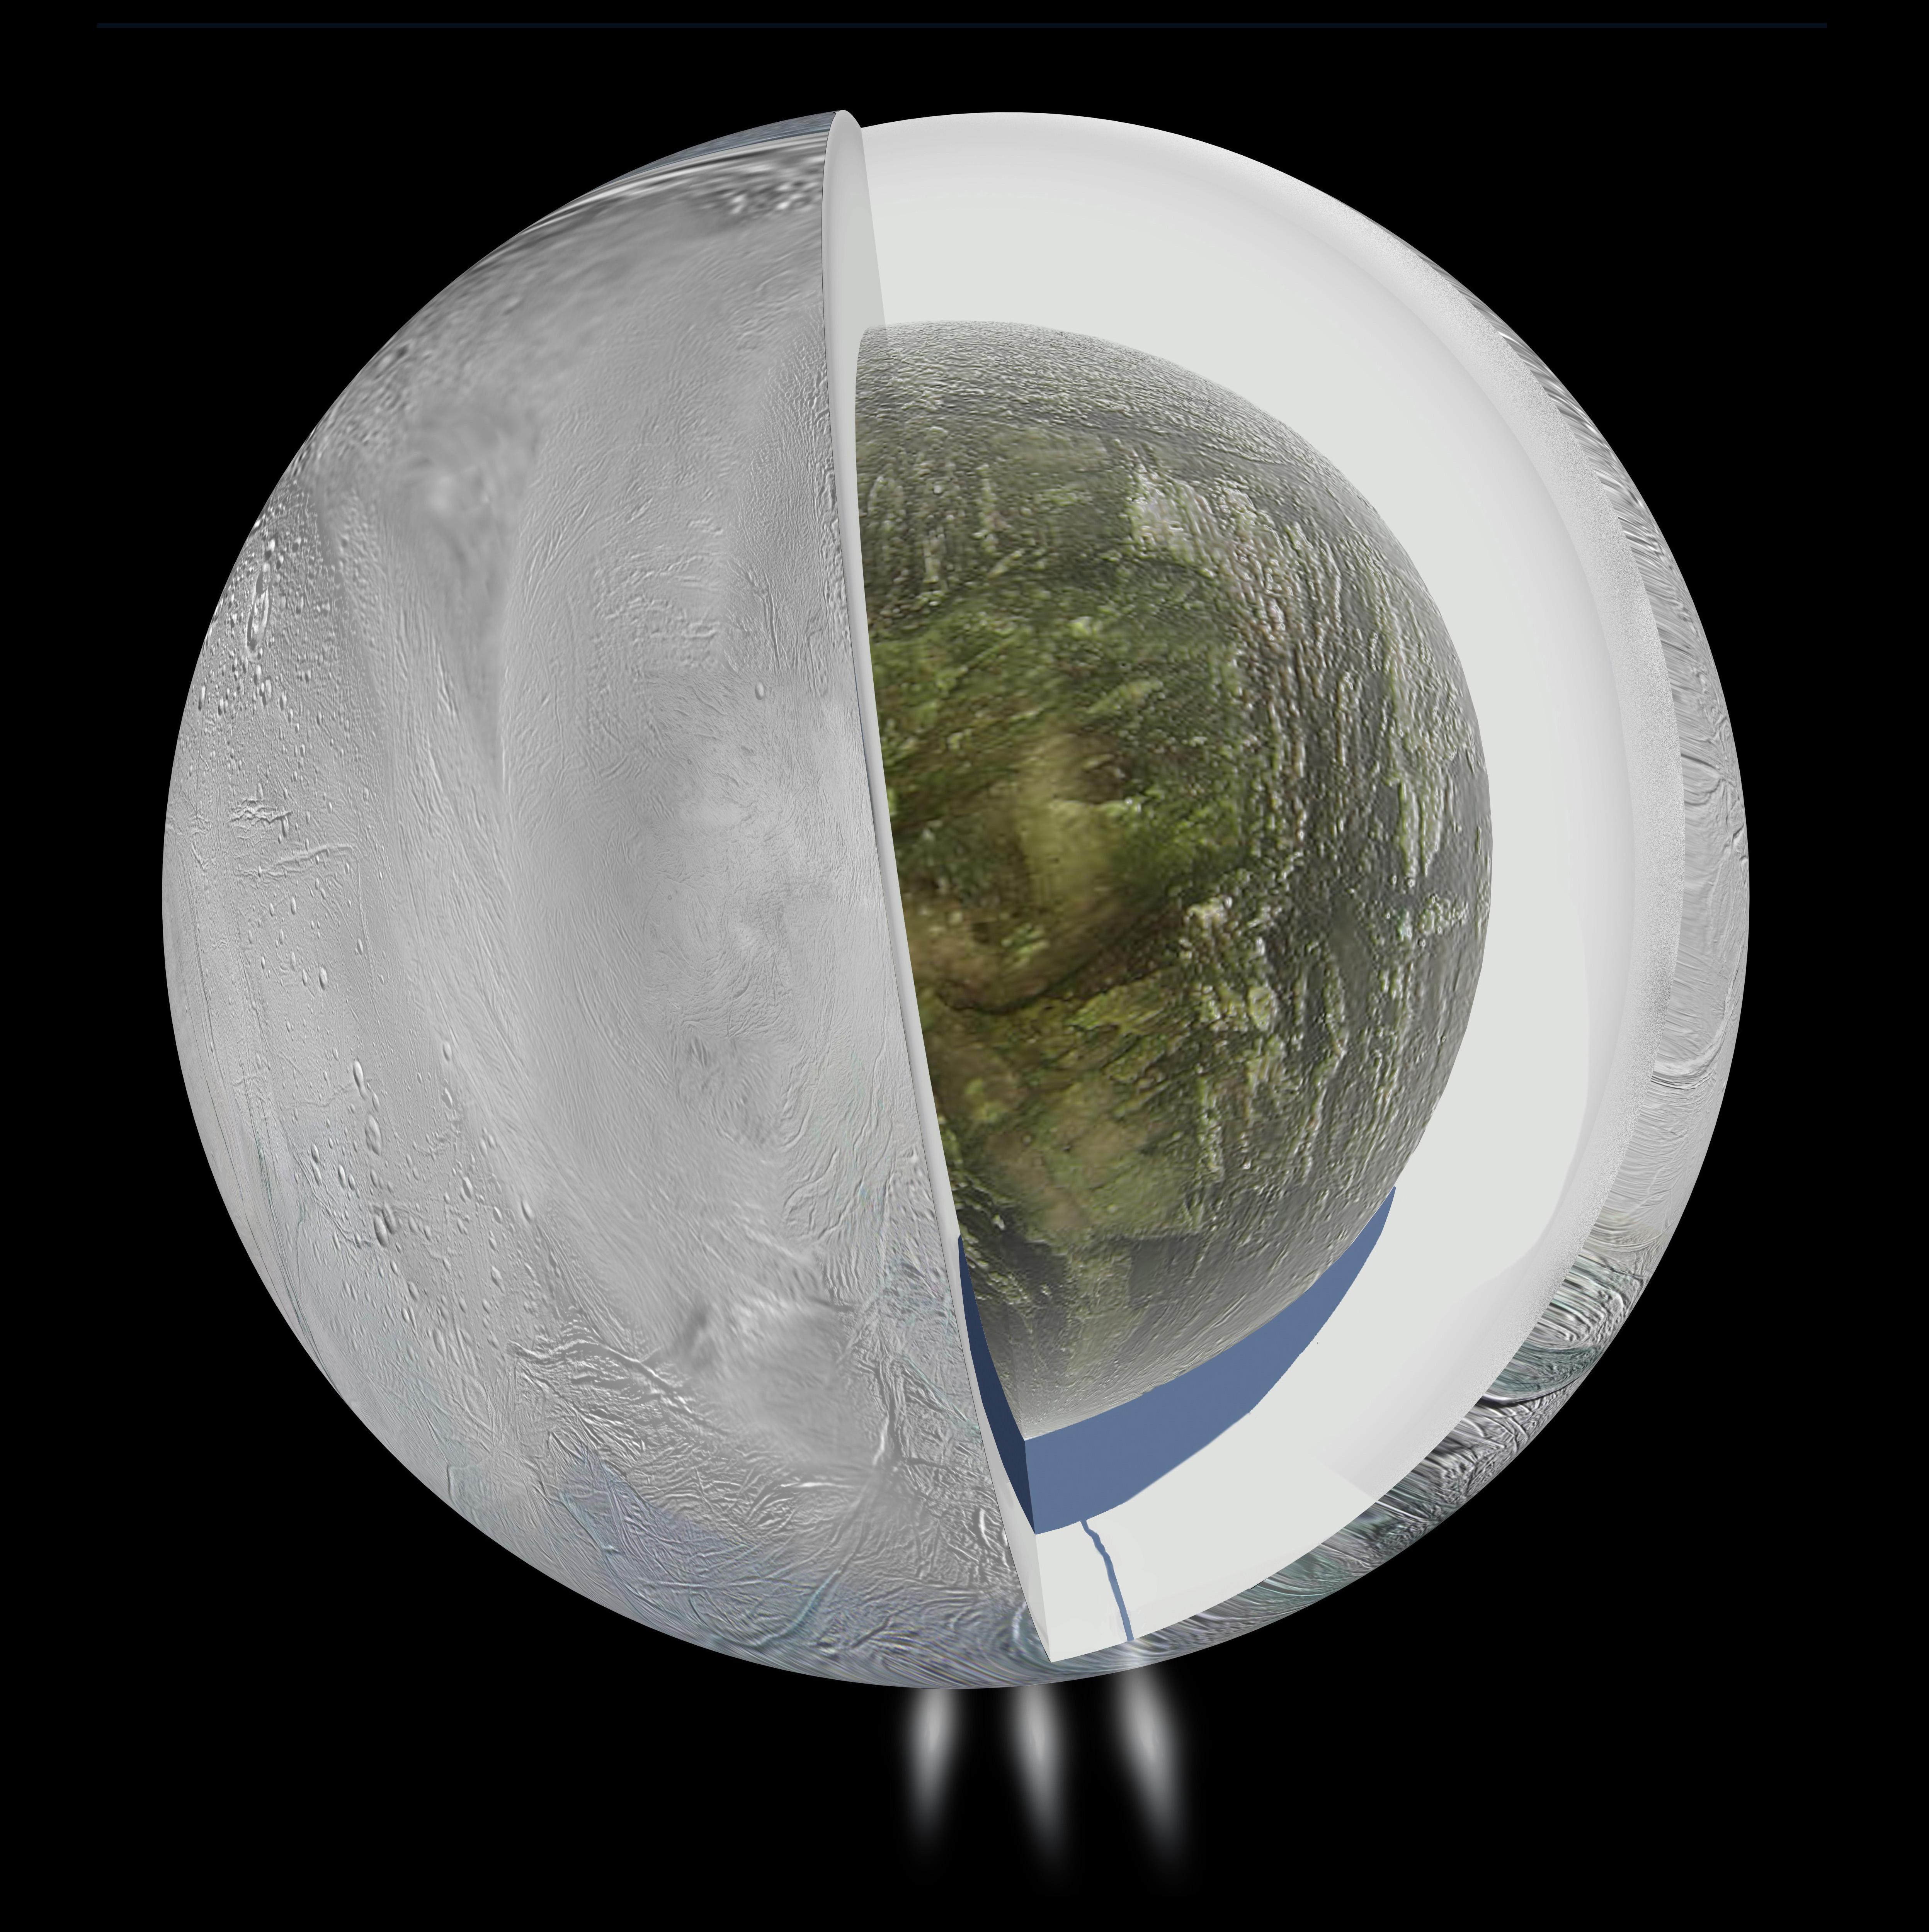 Inside The Moon Diagram Wire Data Schema Beautyamare Eye Makeup Parts Of For Ocean Saturn S Enceladus Nasa Rh Gov Being Studied Axis